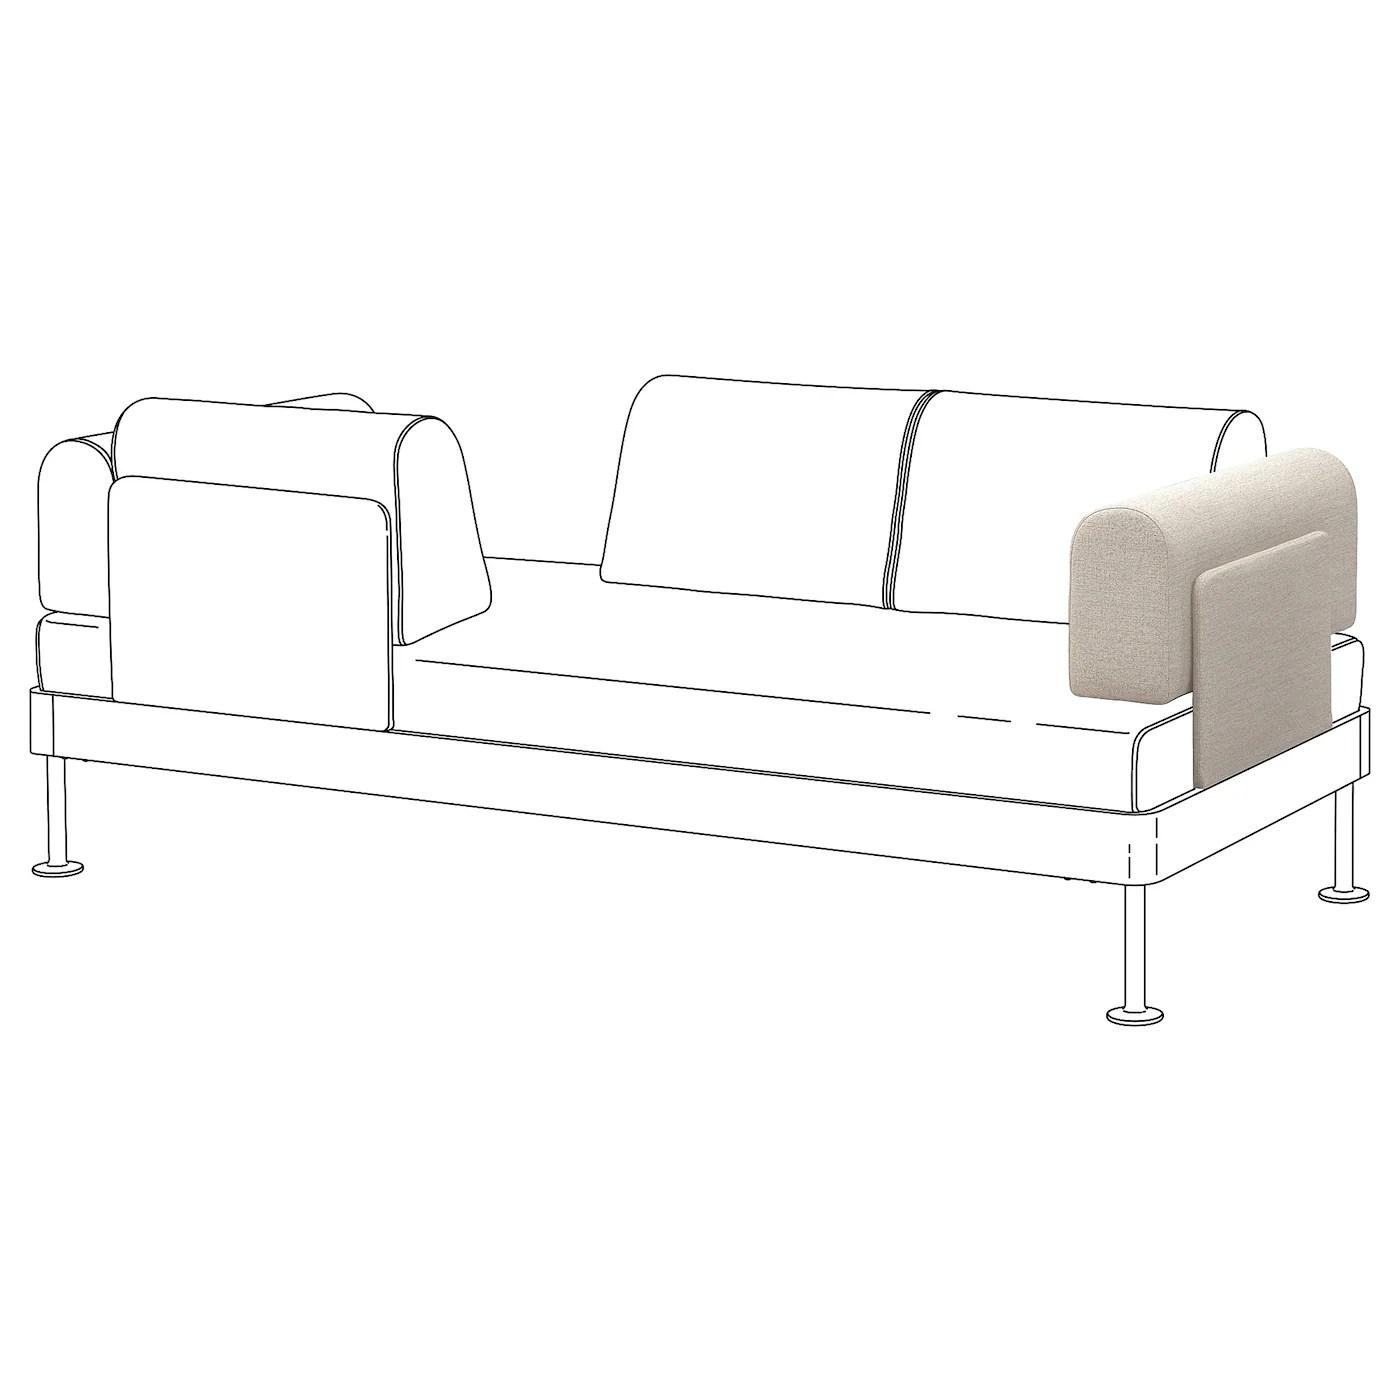 Modular Sofas Amp Sectional Sofas